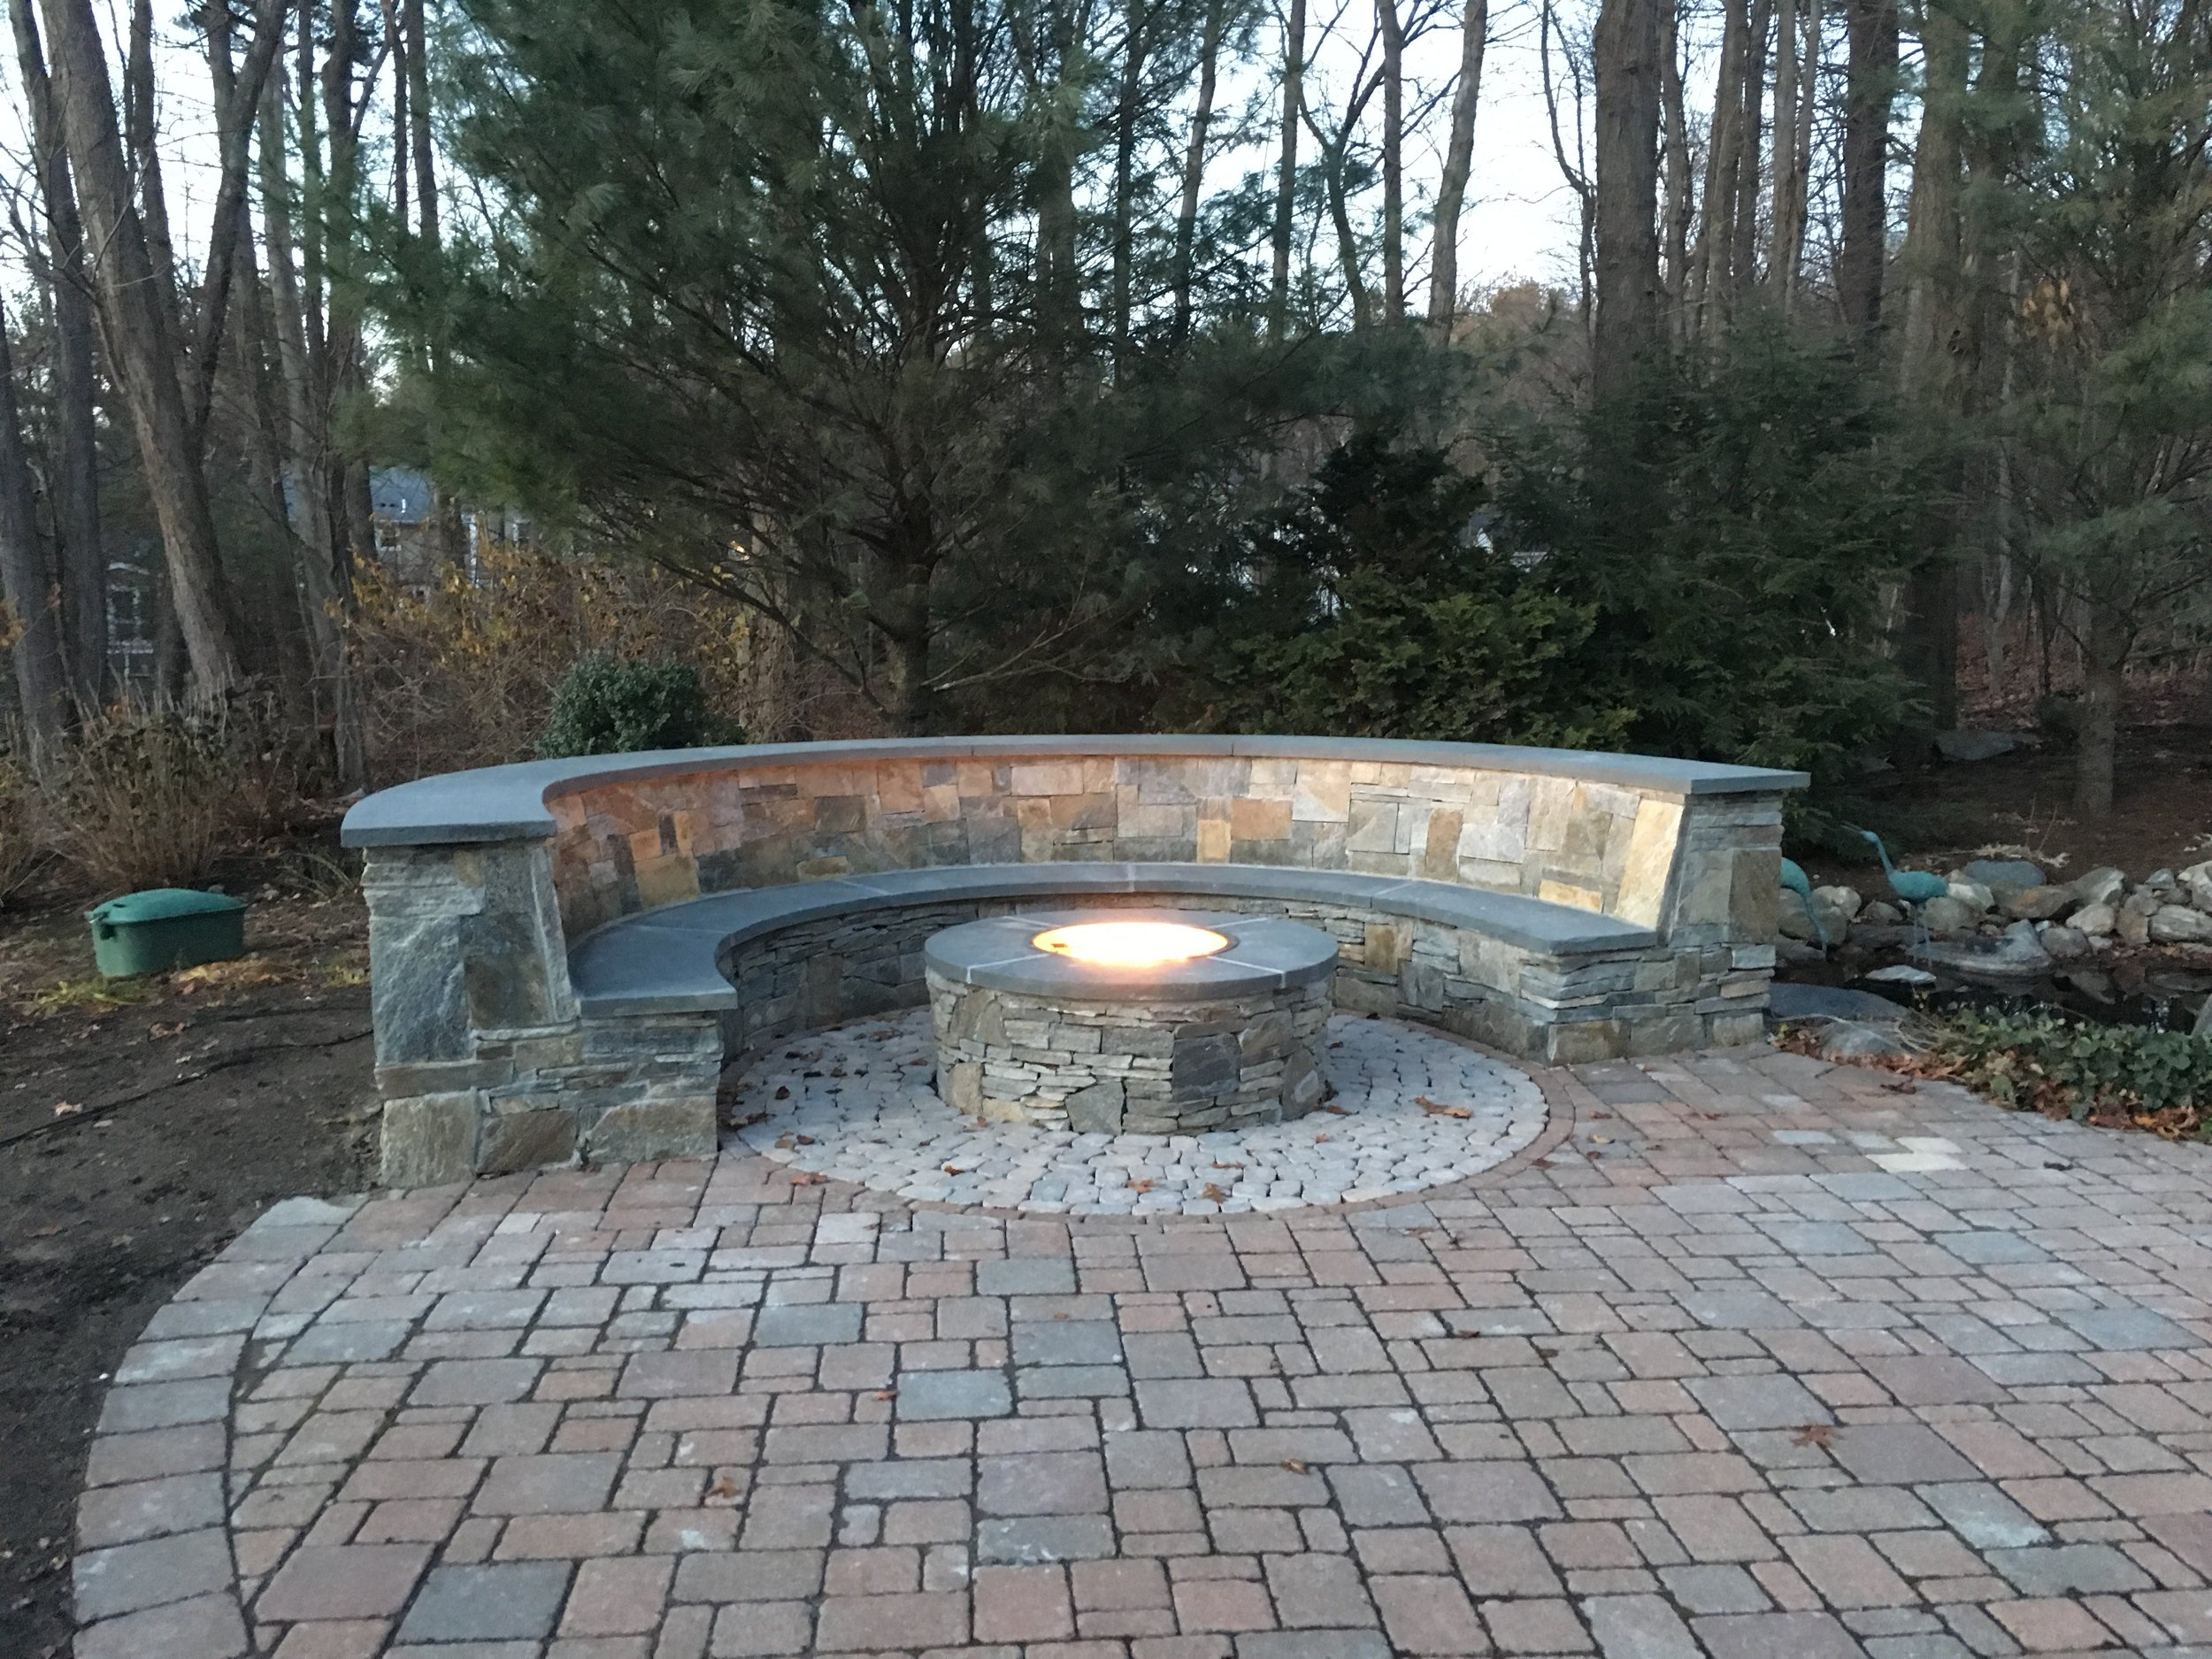 Fire pits, stone walls, patio